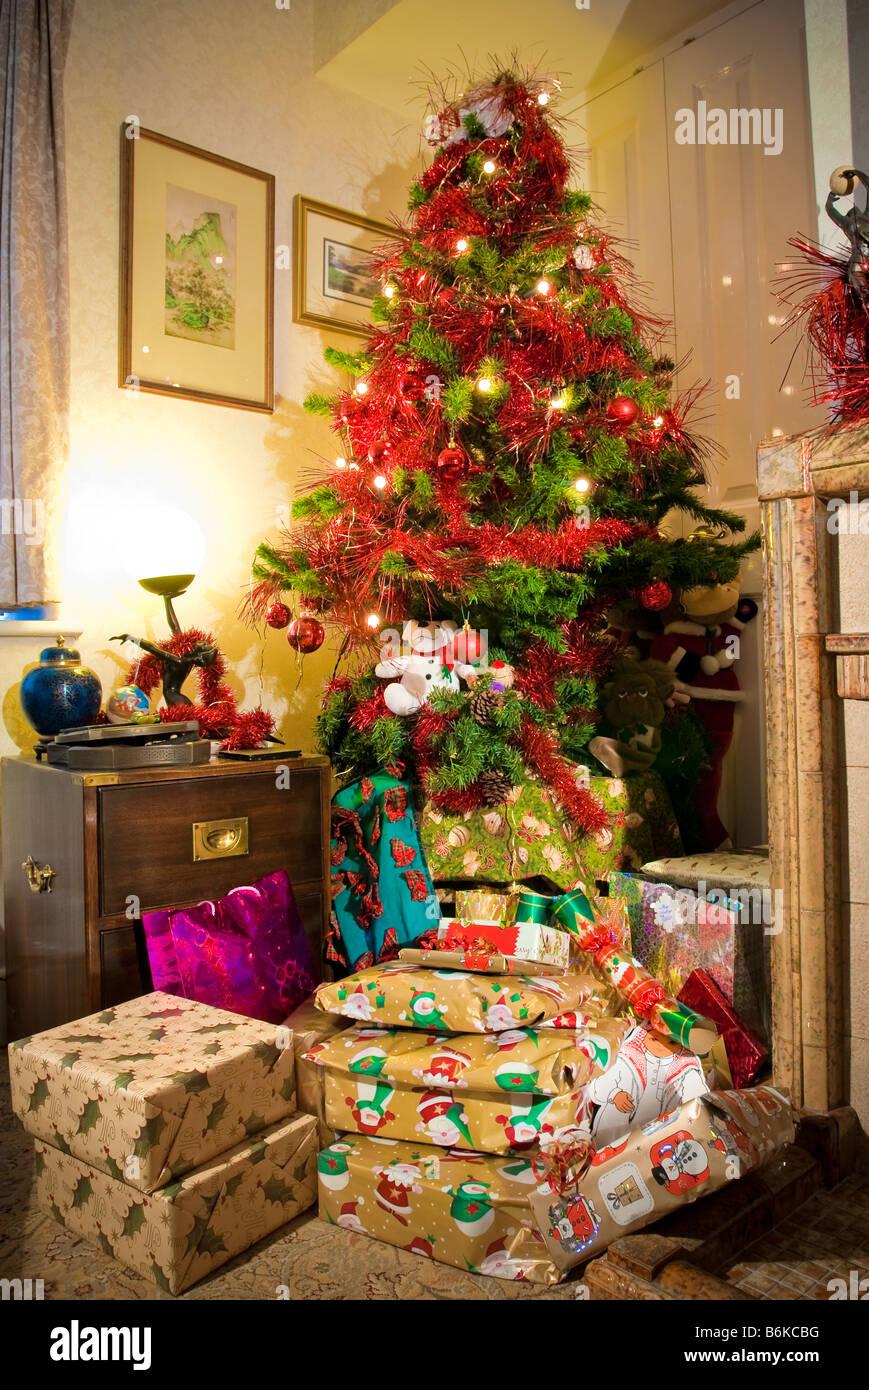 Christmas presents under the tree Stock Photo: 21325124 - Alamy